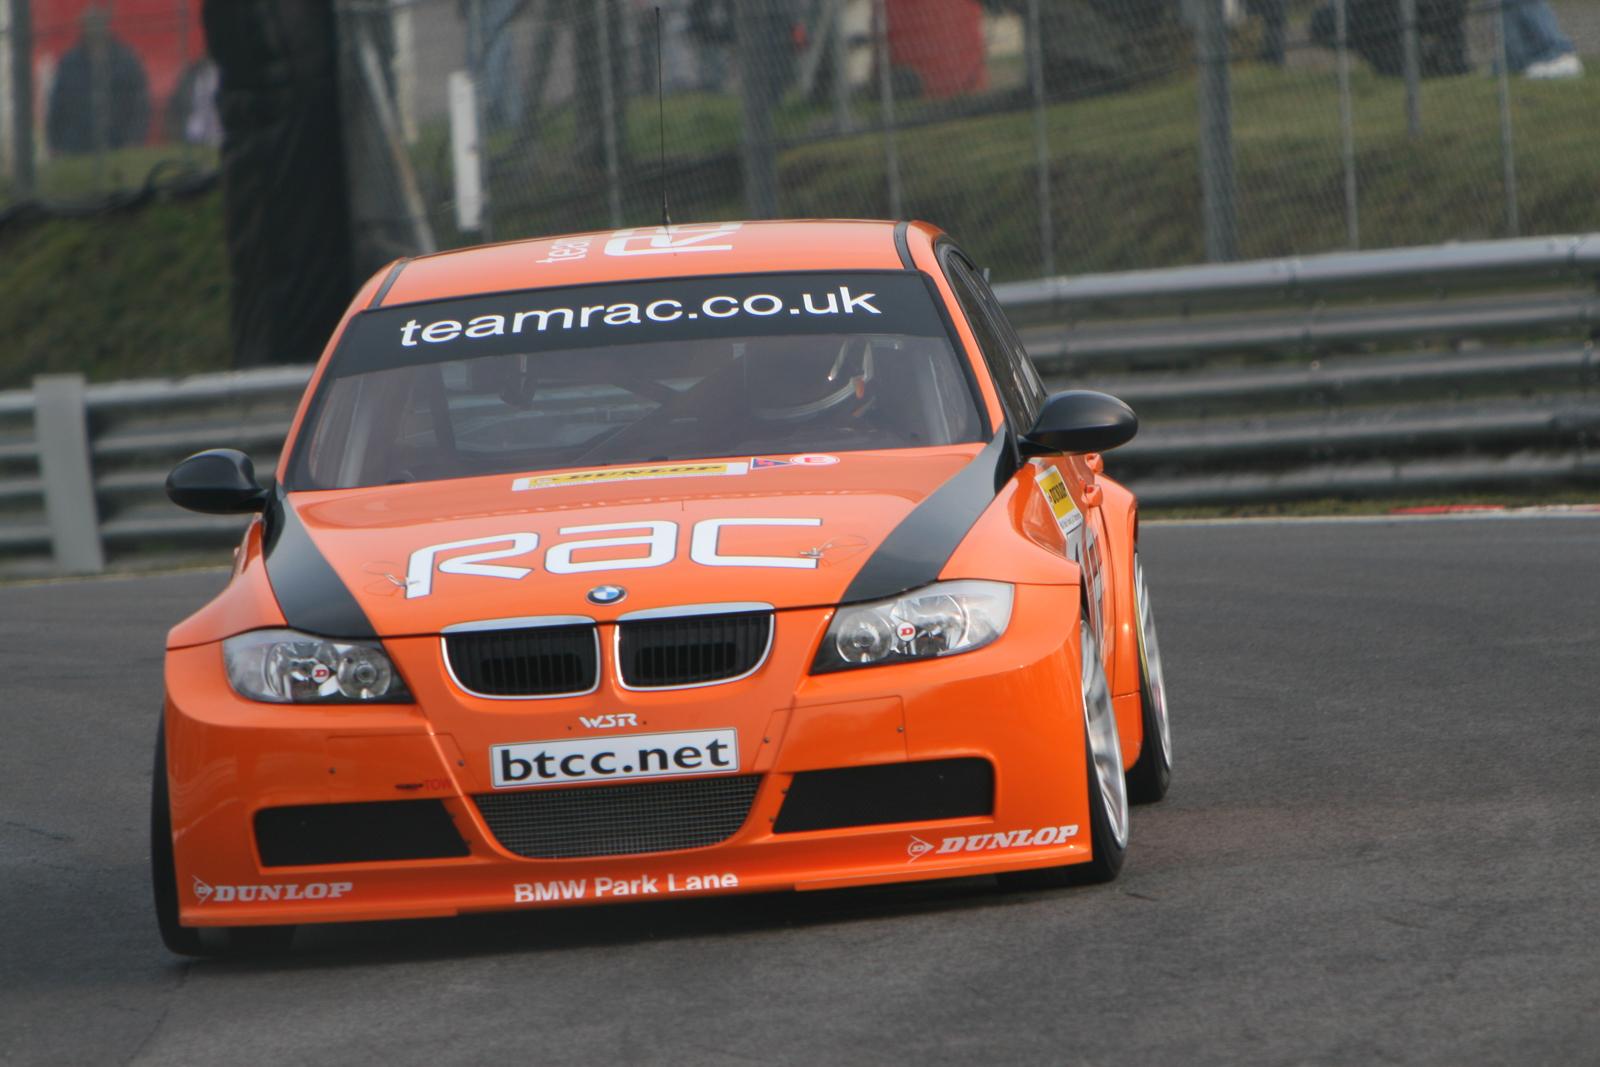 20070331 - BTCC Brands -070331 -003